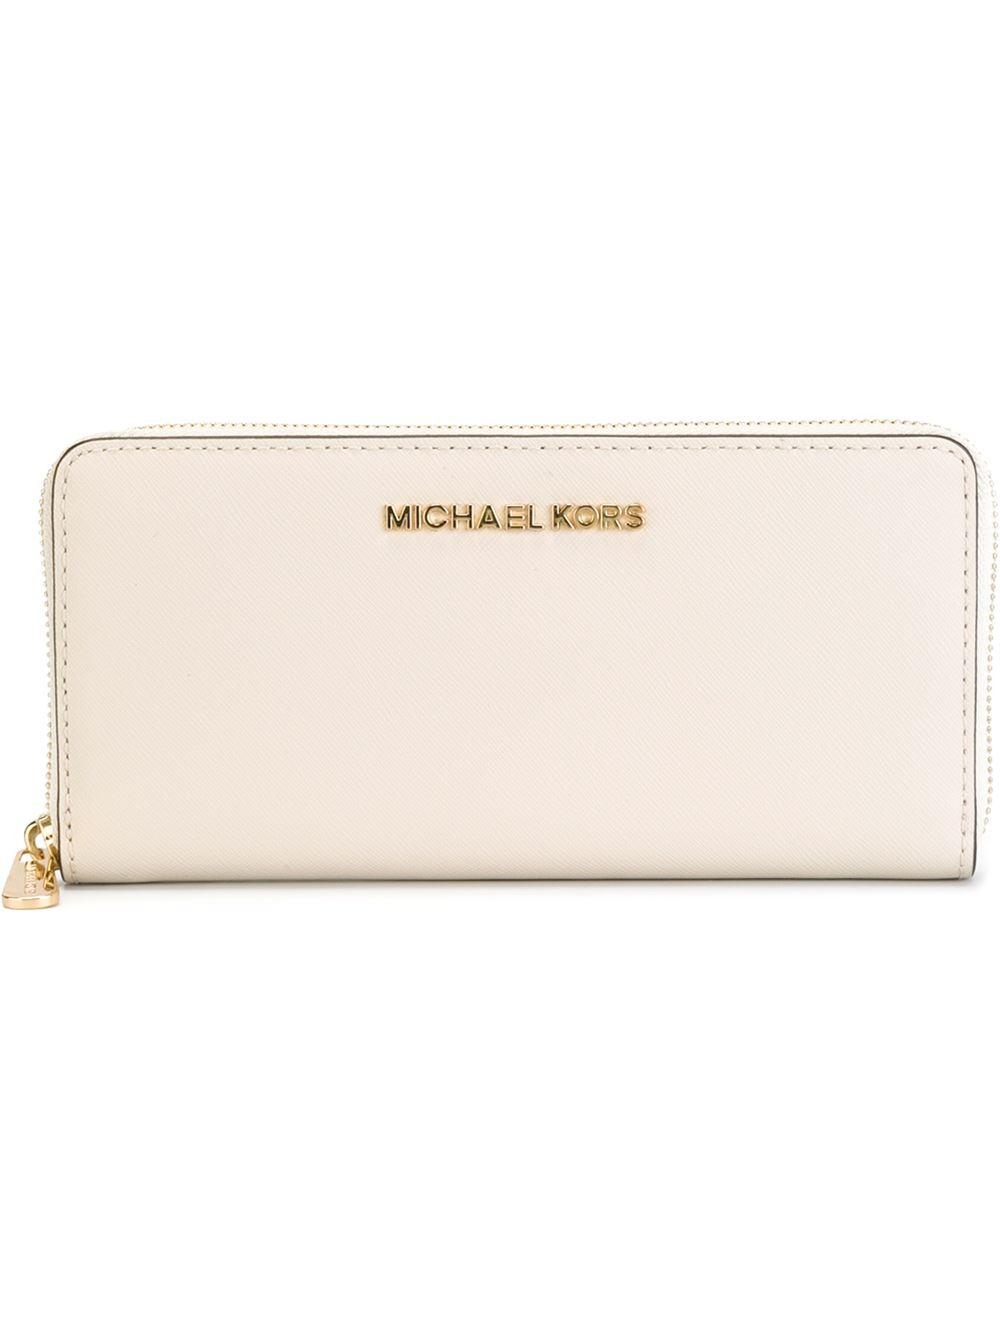 99b44b40cfd8 MICHAEL Michael Kors  jet Set Travel  Wallet in Natural - Lyst